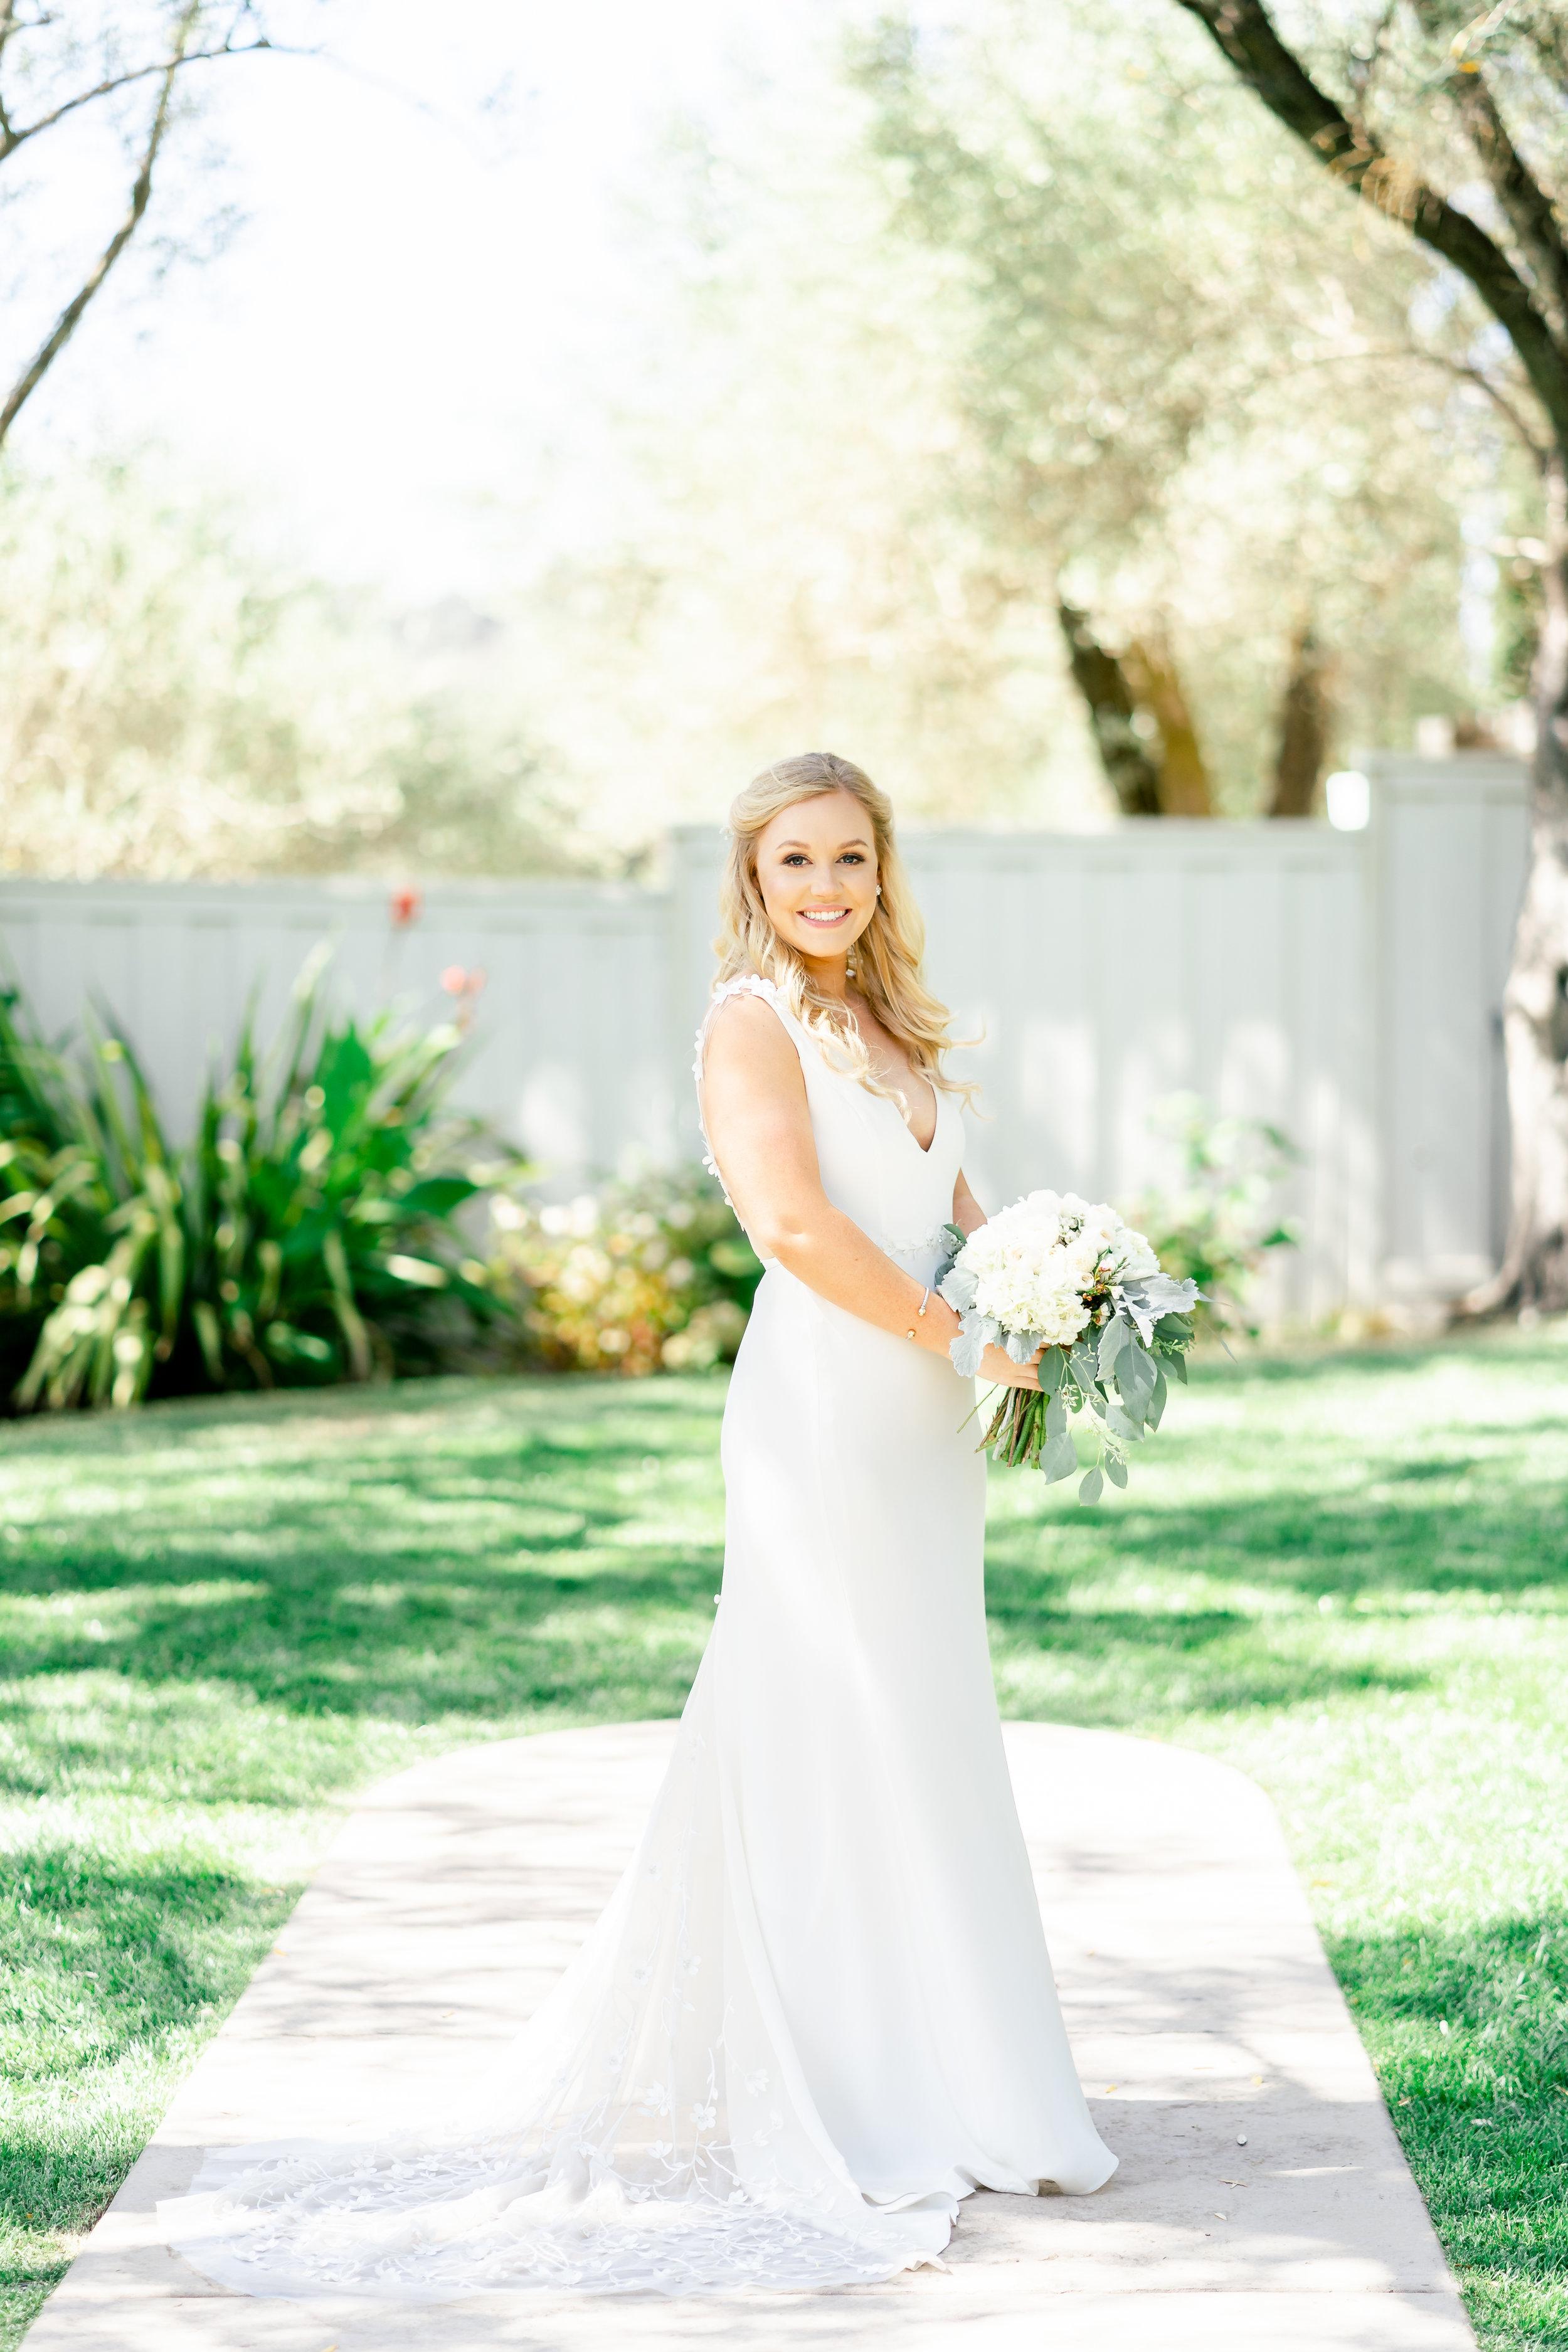 CorinnaRosePhotography-Highlights-65.jpg